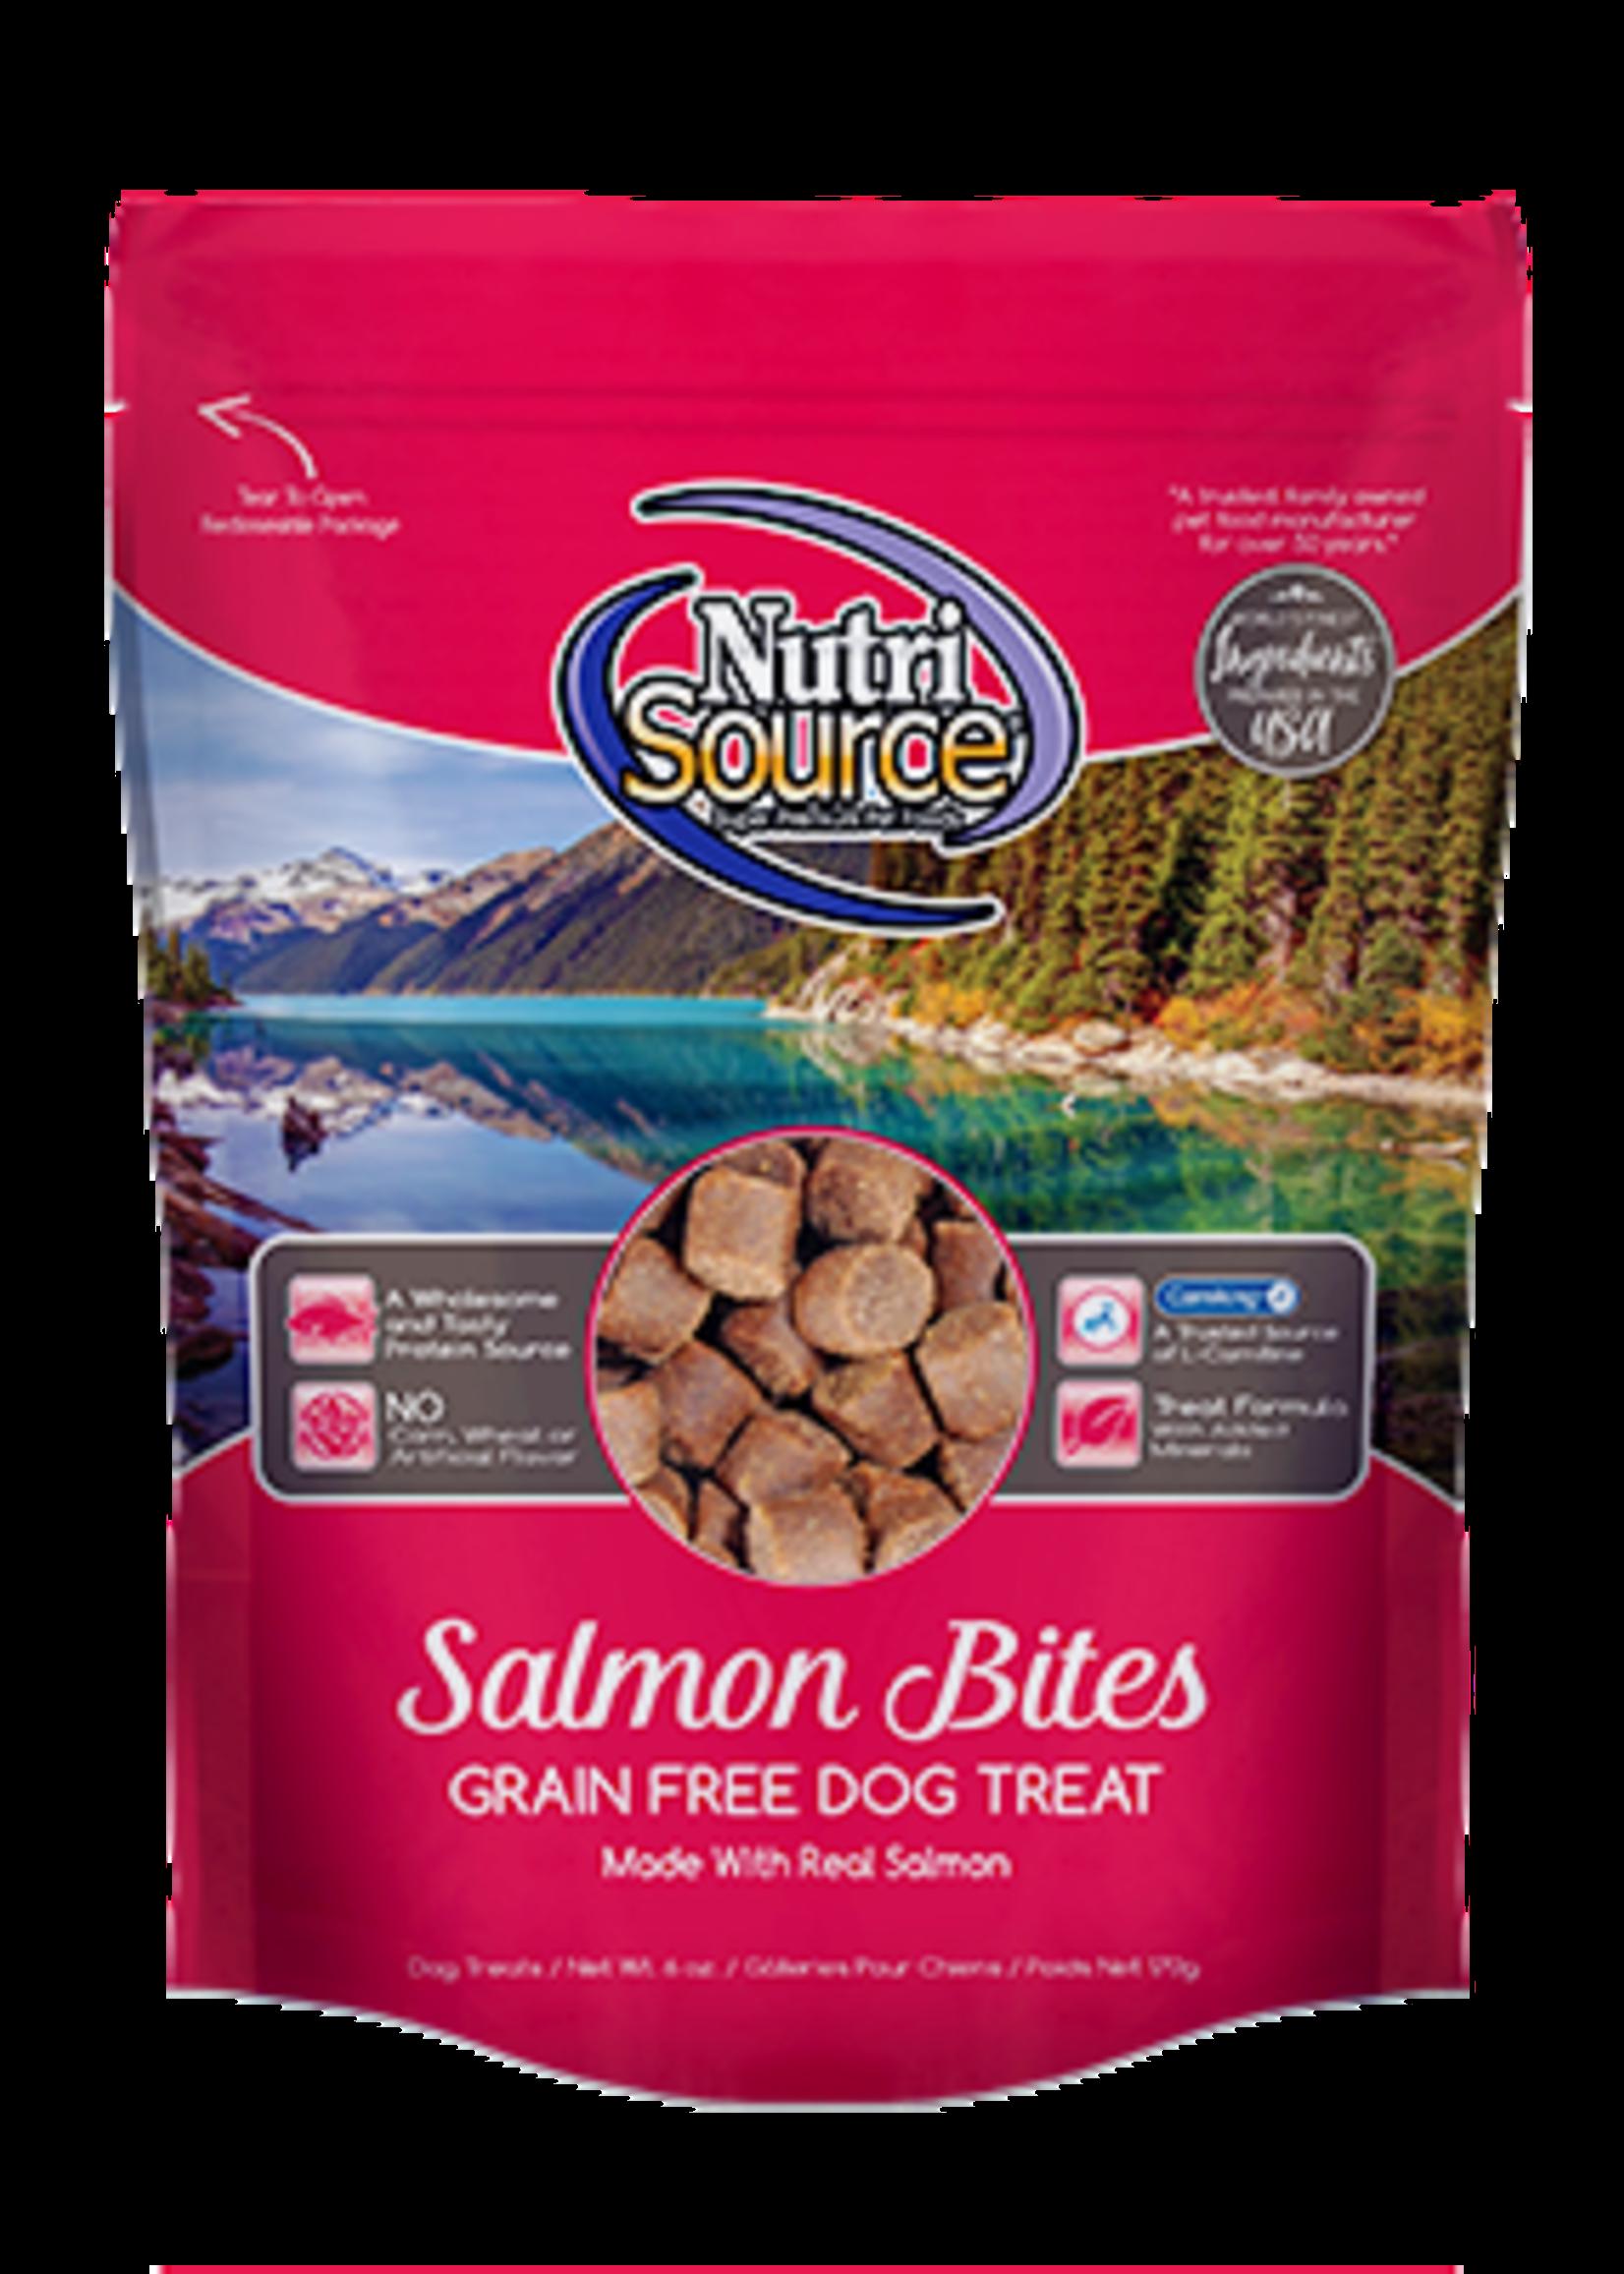 NutriSource NutriSource Dog Treat Grain Free Salmon Bites 6 oz